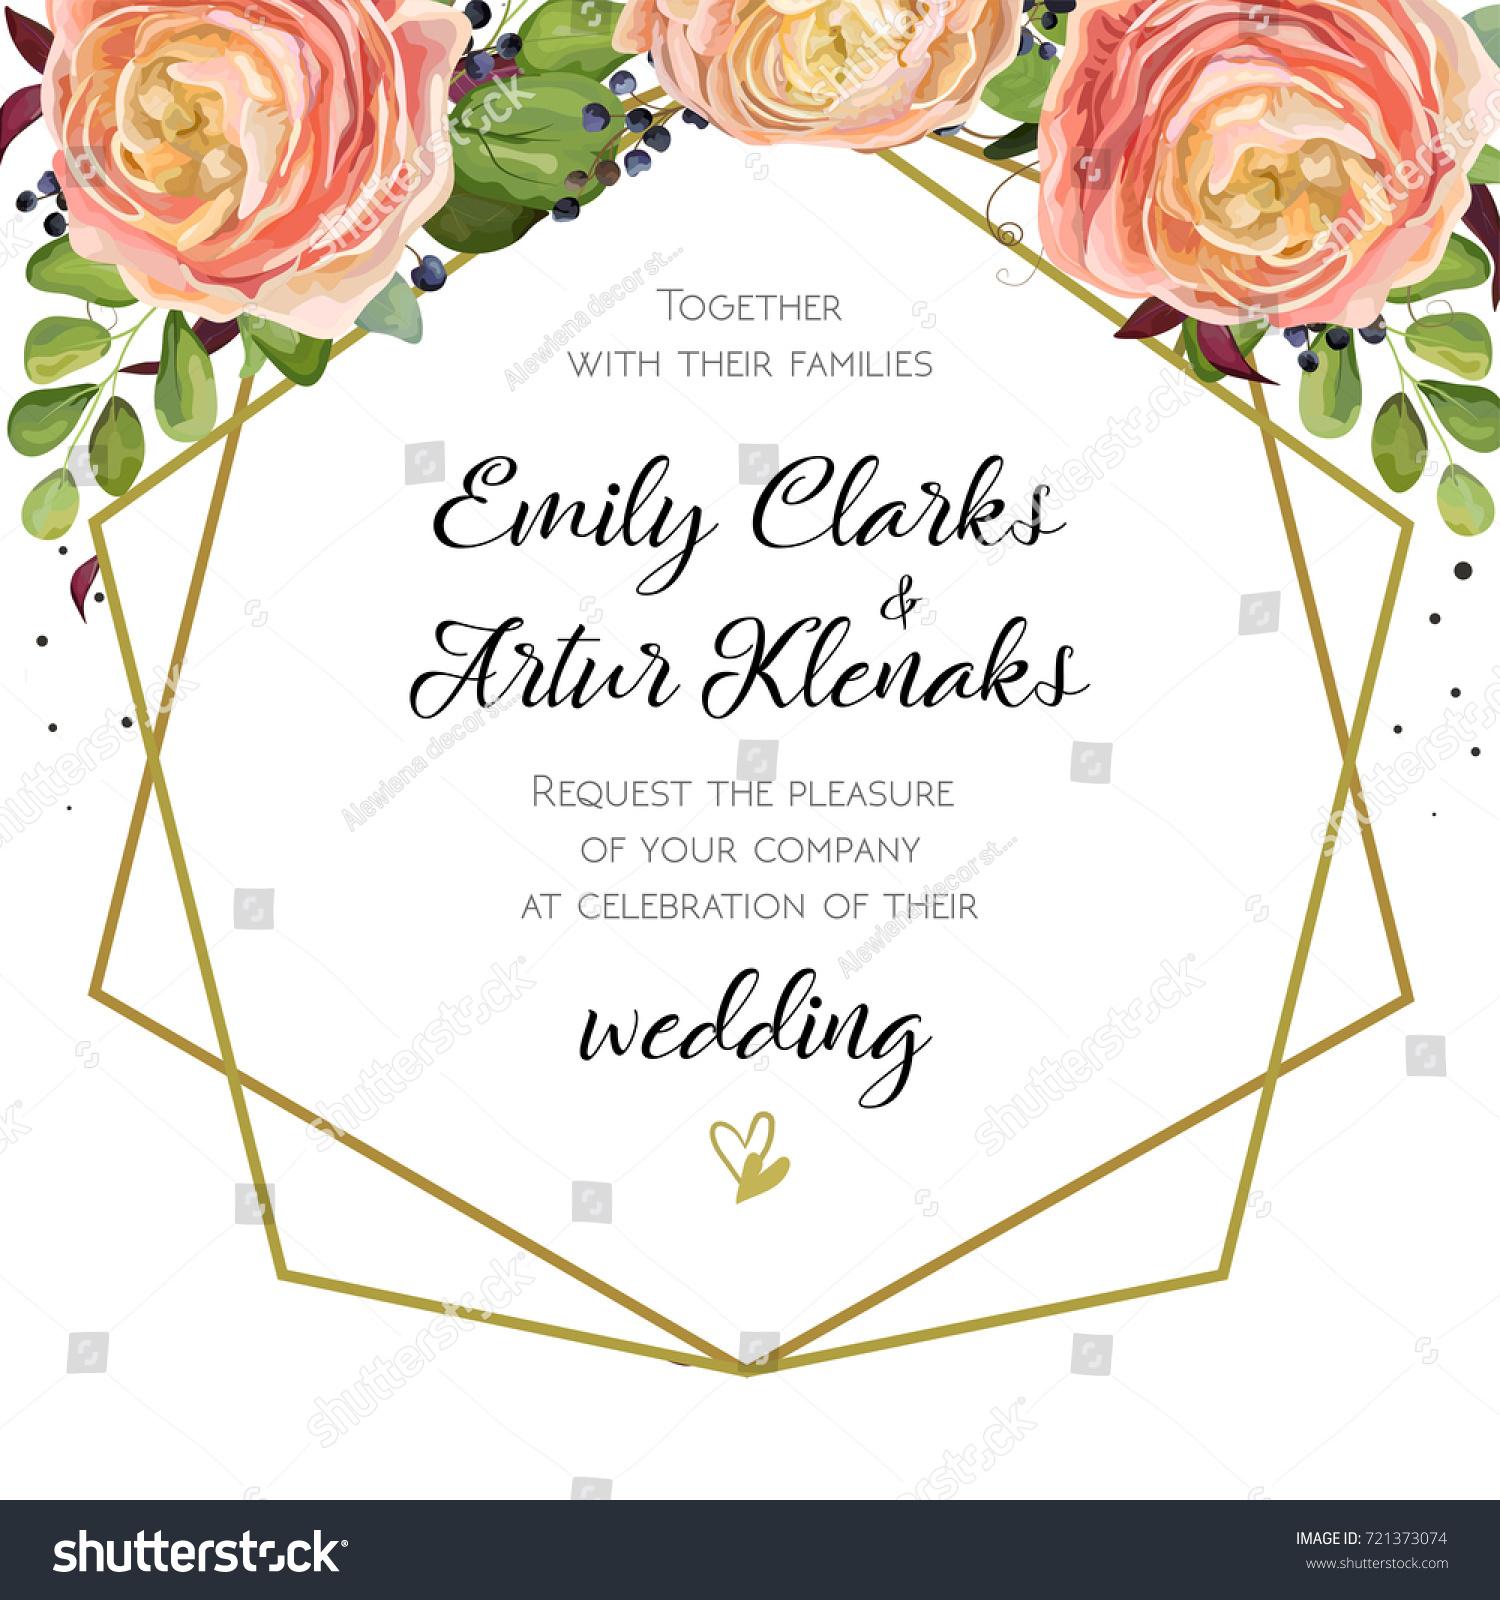 Wedding invitation floral watercolor invite card em vetor stock wedding invitation floral watercolor invite card design with pink peach ranunculus flowers blue berry stopboris Choice Image